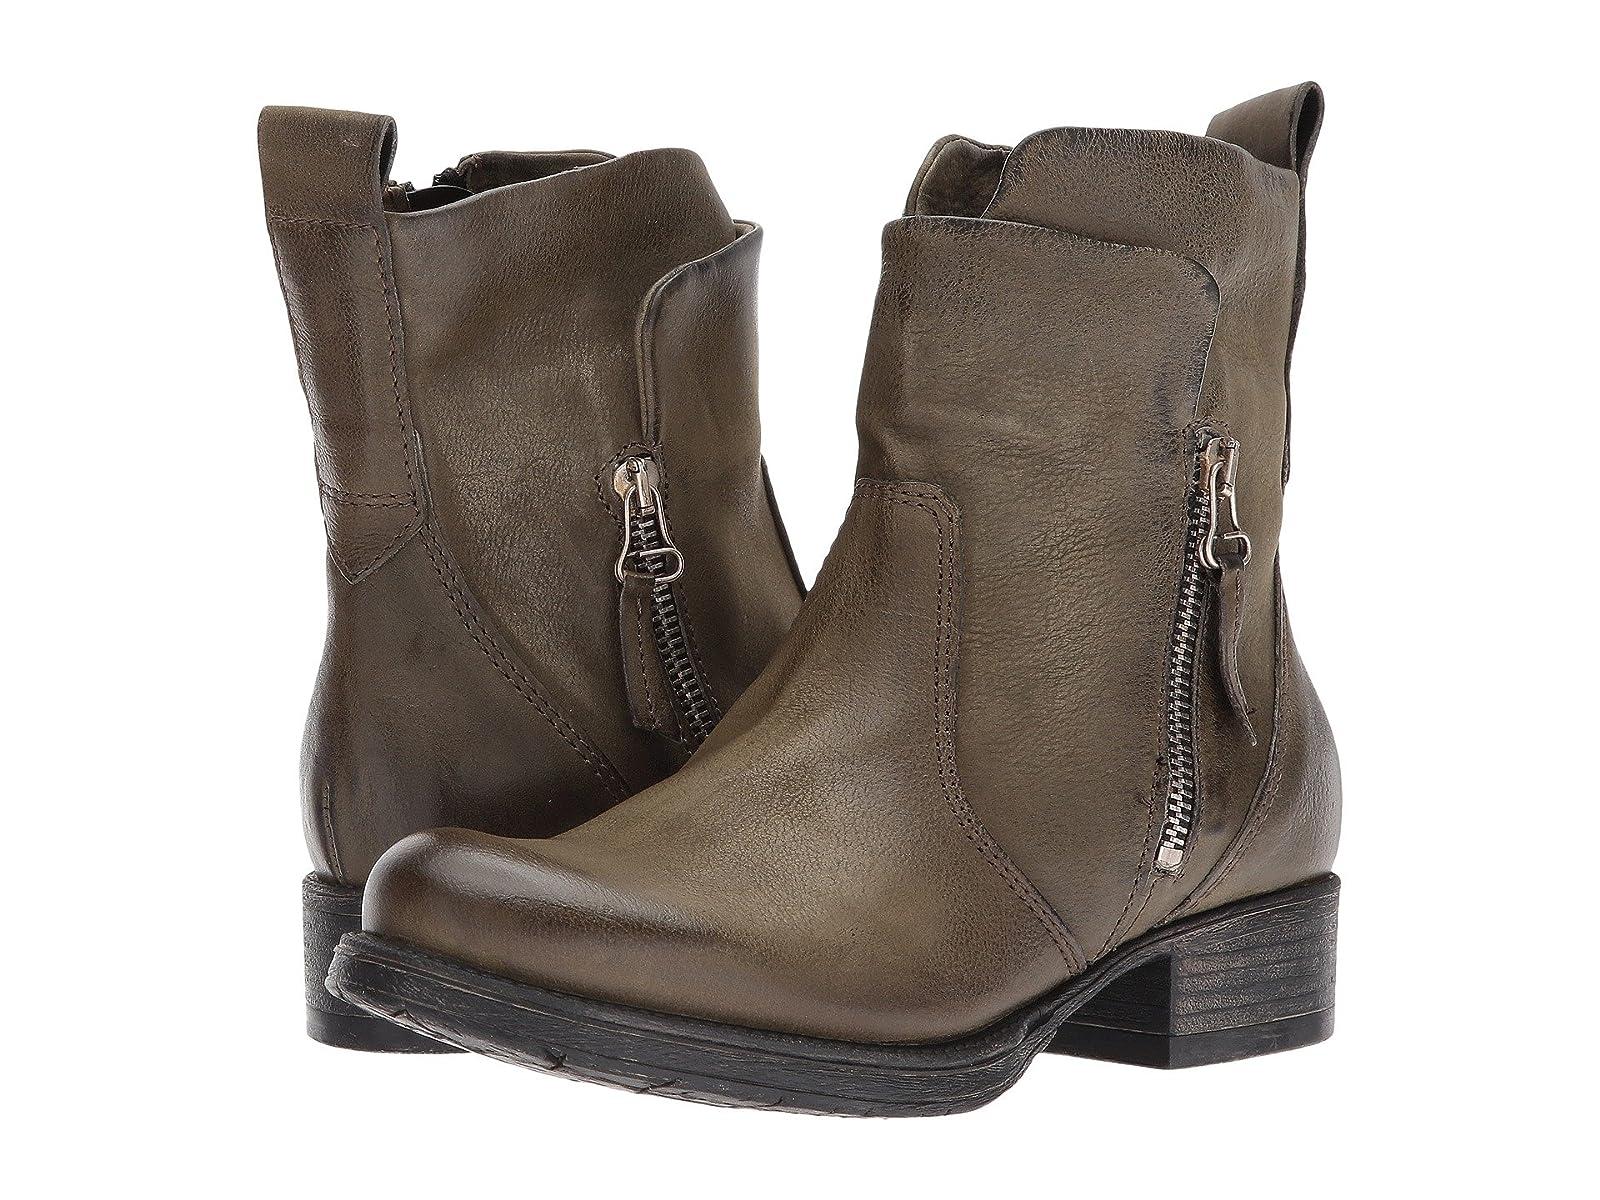 Miz Mooz NimbleCheap and distinctive eye-catching shoes